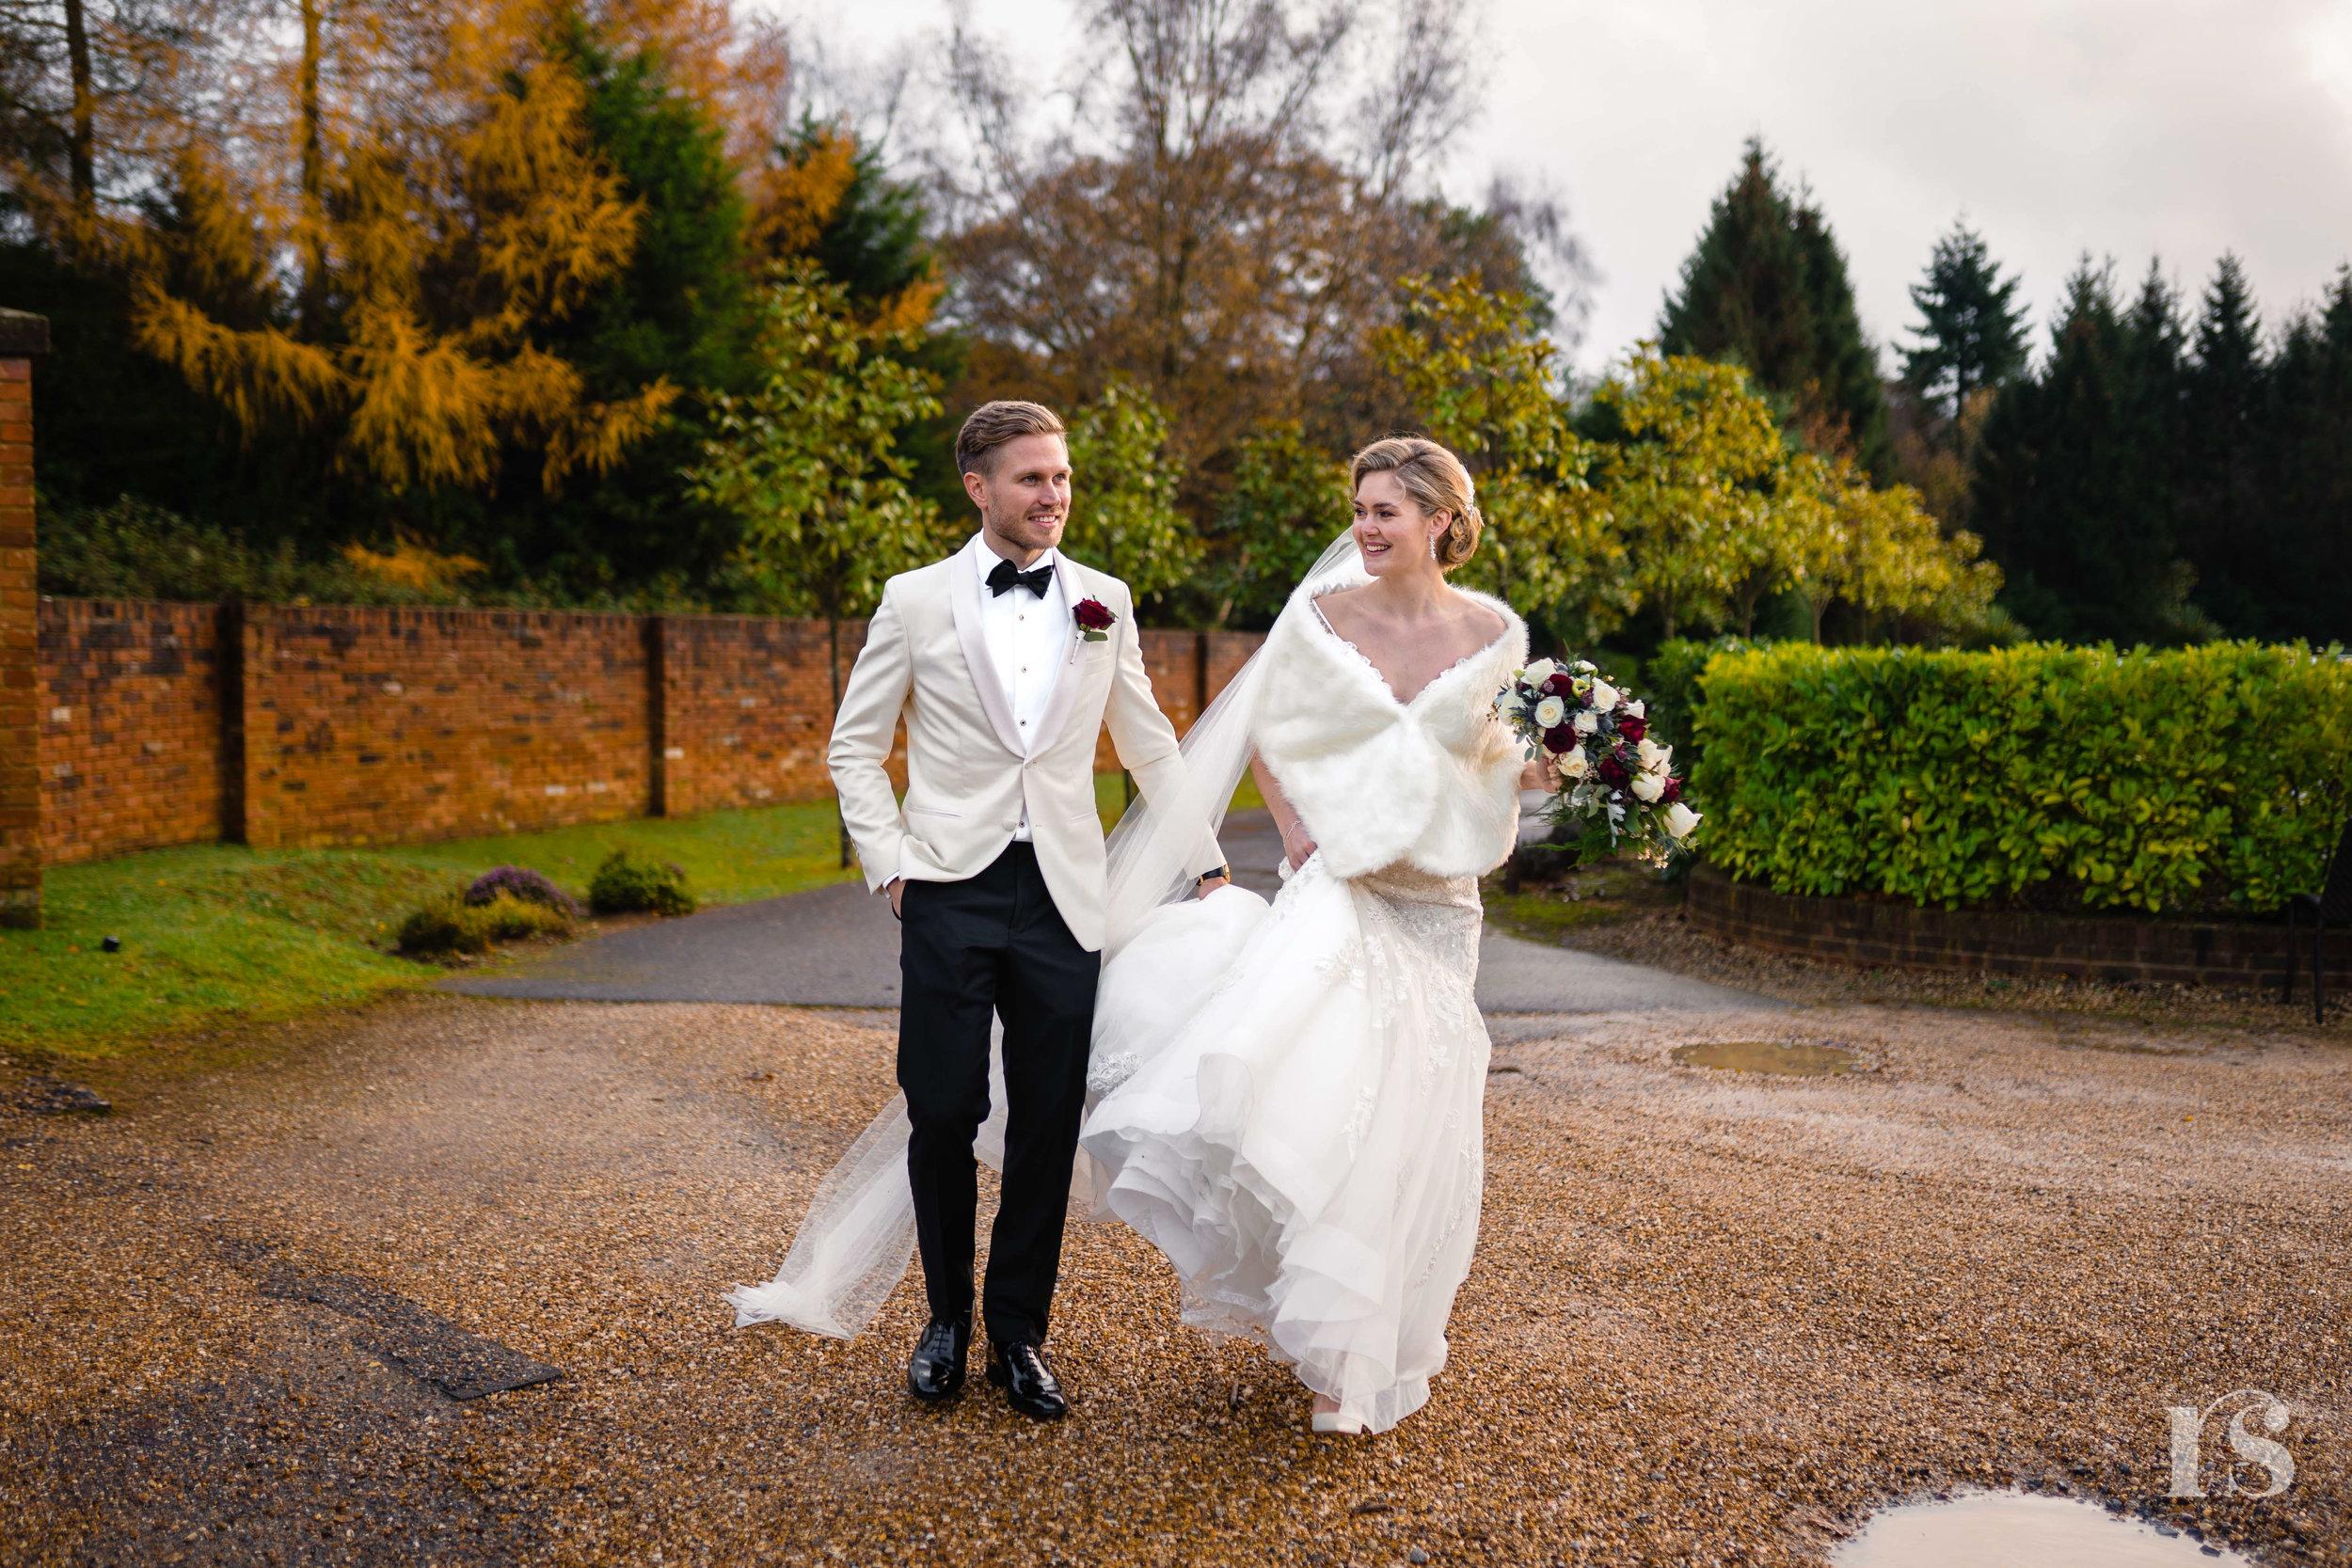 cain-manor-winter-wedding-85.jpg